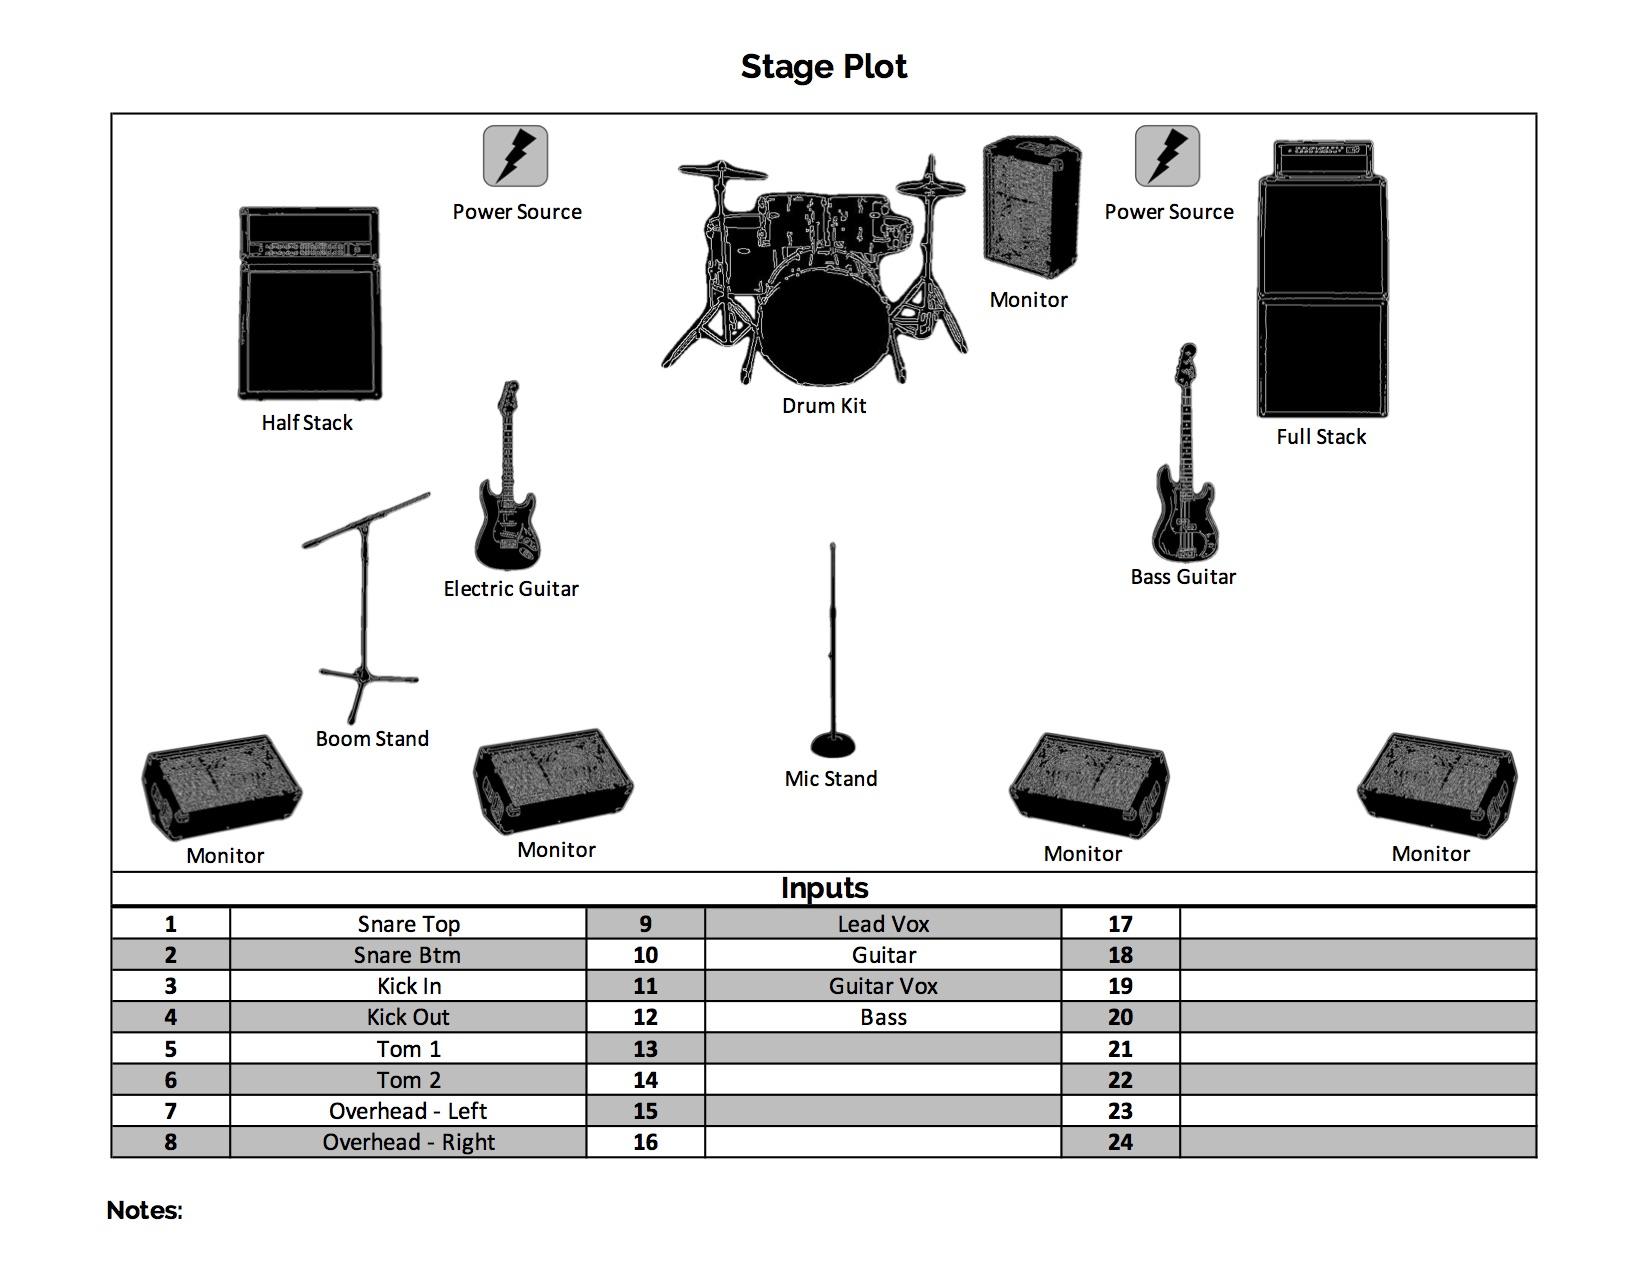 Stage Plot Designer